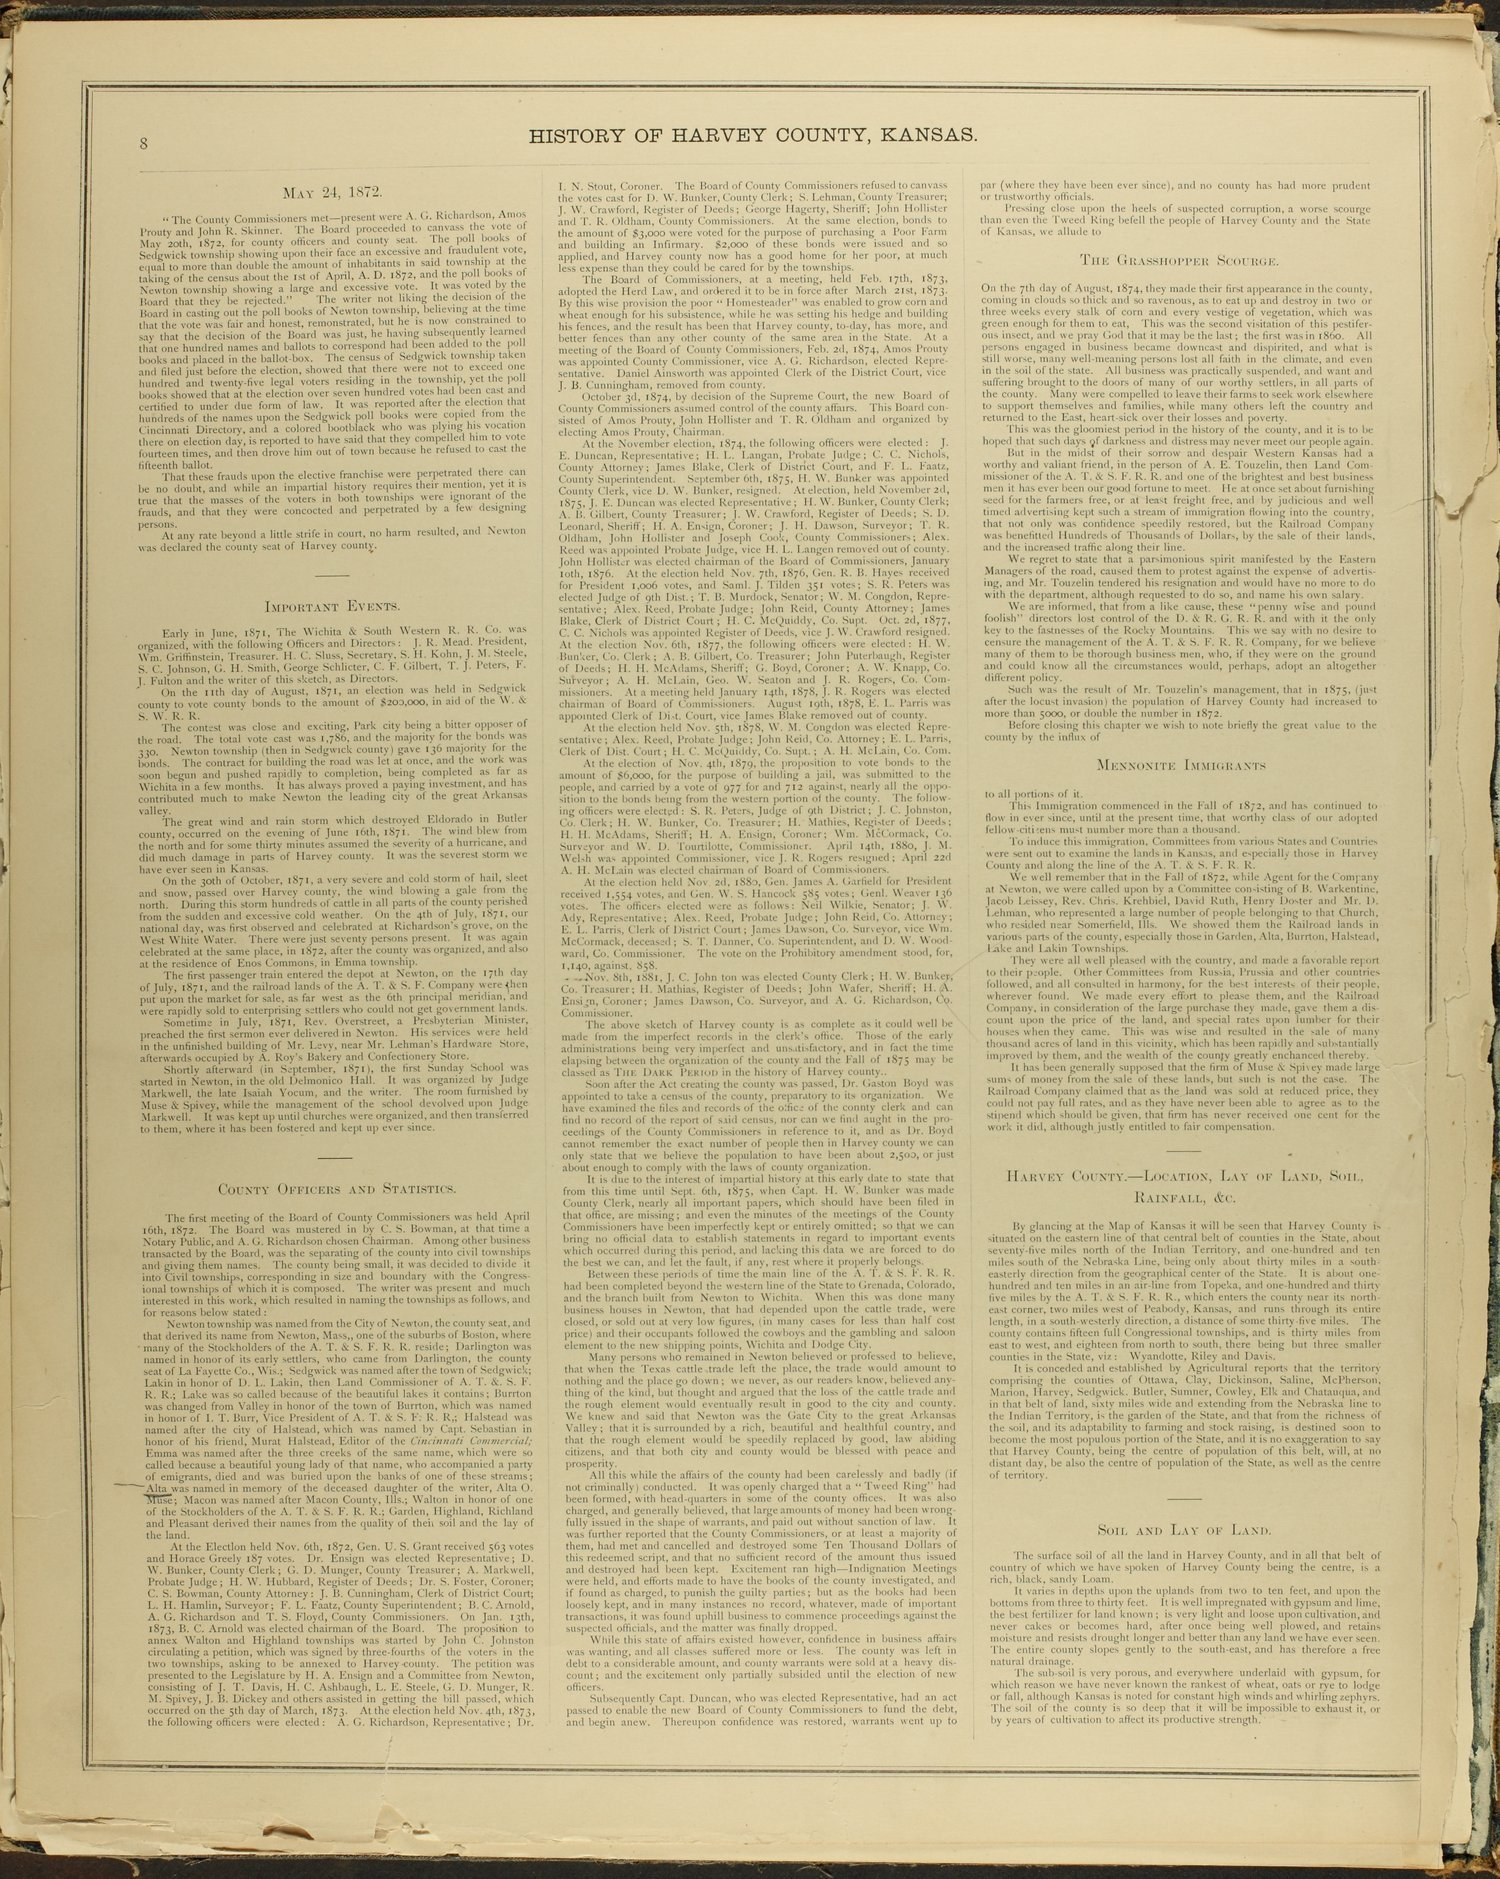 Historical atlas of Harvey County, Kansas - 8